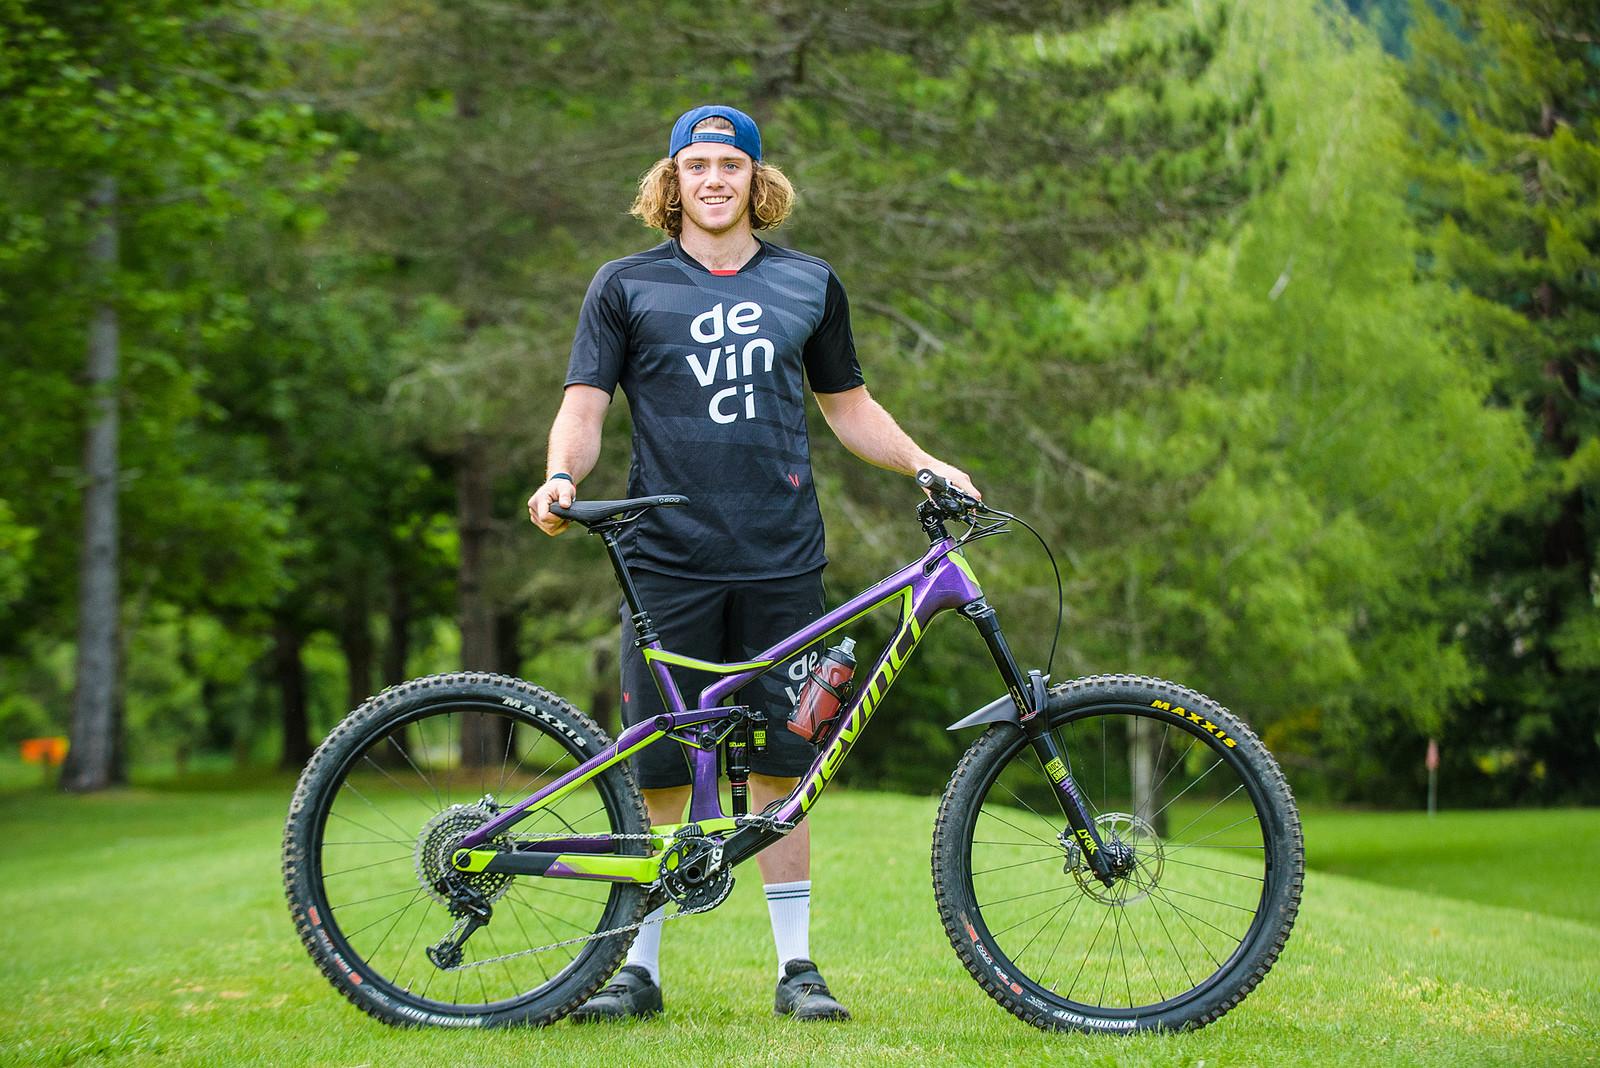 Pro Bike Check: Keegan Wright's Devinci Spartan Carbon - Pro Bike Check: Keegan Wright's Devinci Spartan Carbon - Mountain Biking Pictures - Vital MTB